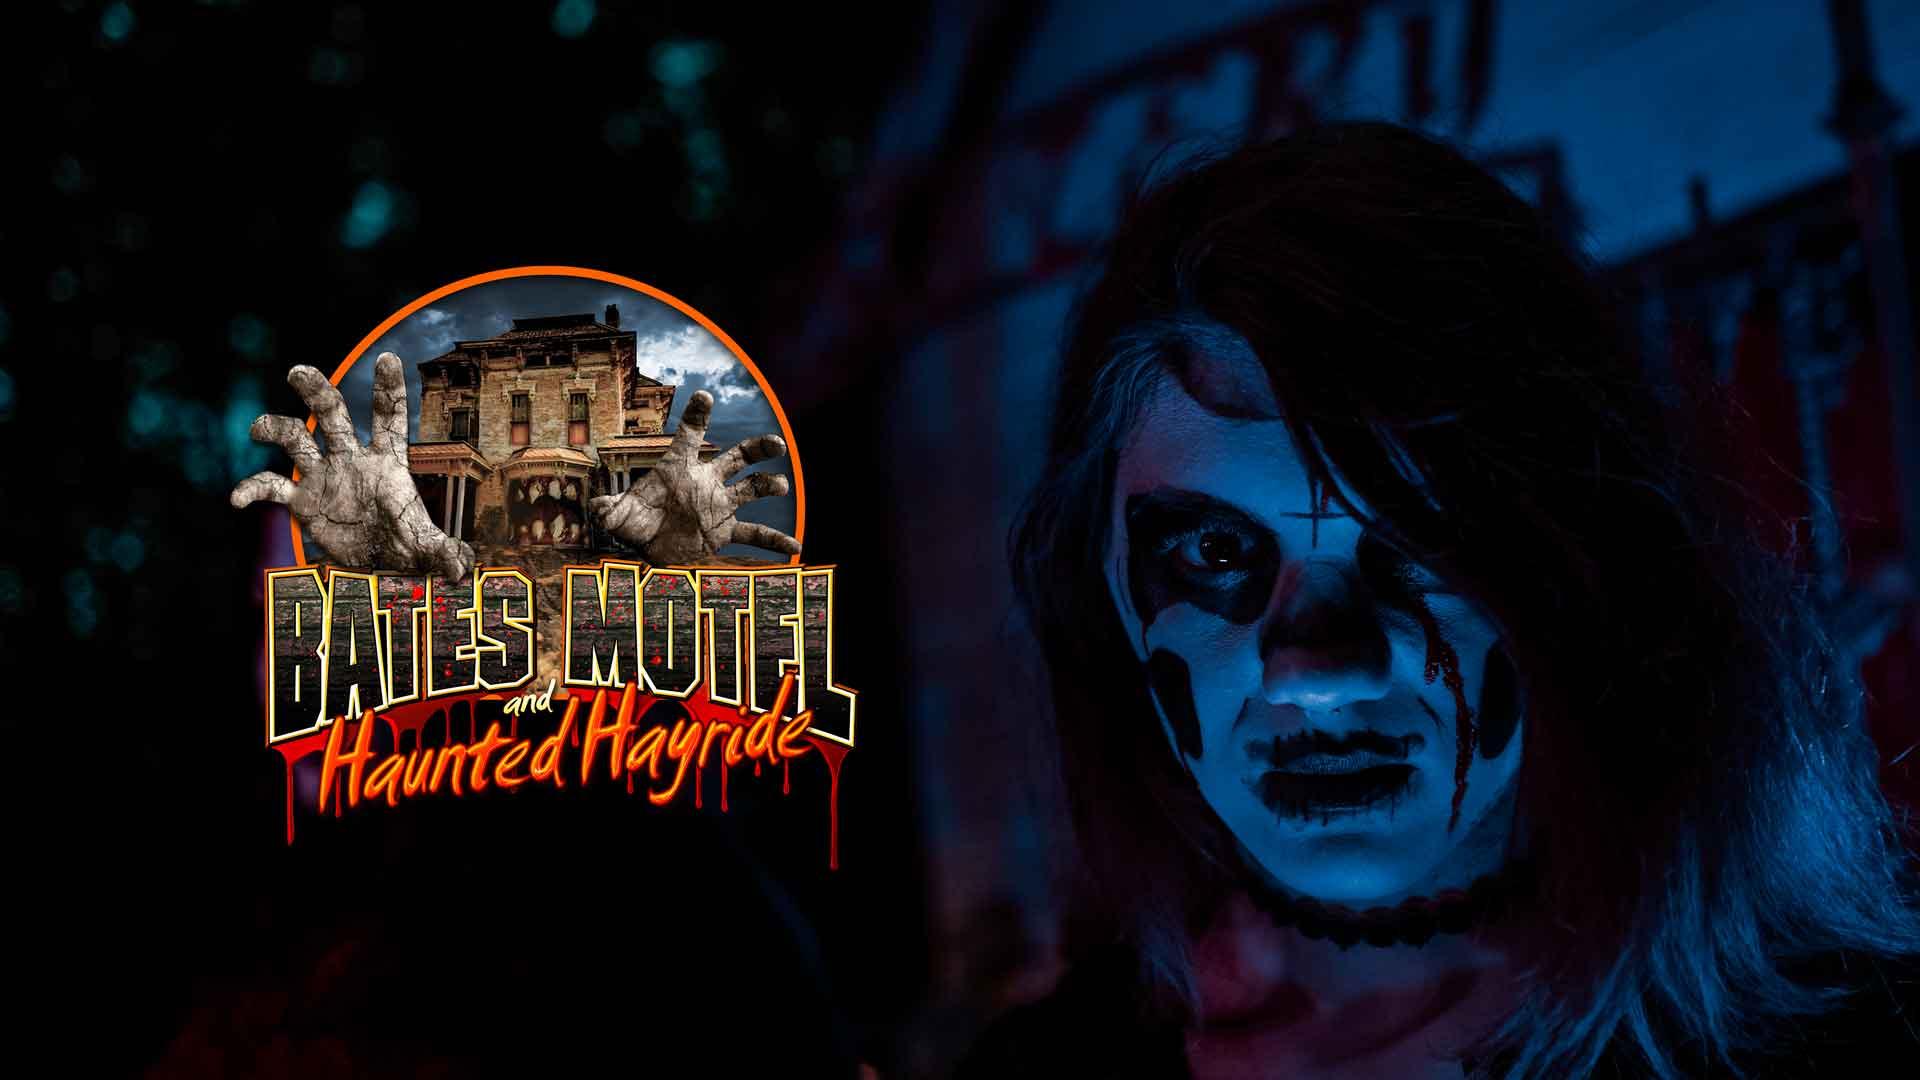 Haunted Hayride And Bates Motel Haunted House Pennsylvania